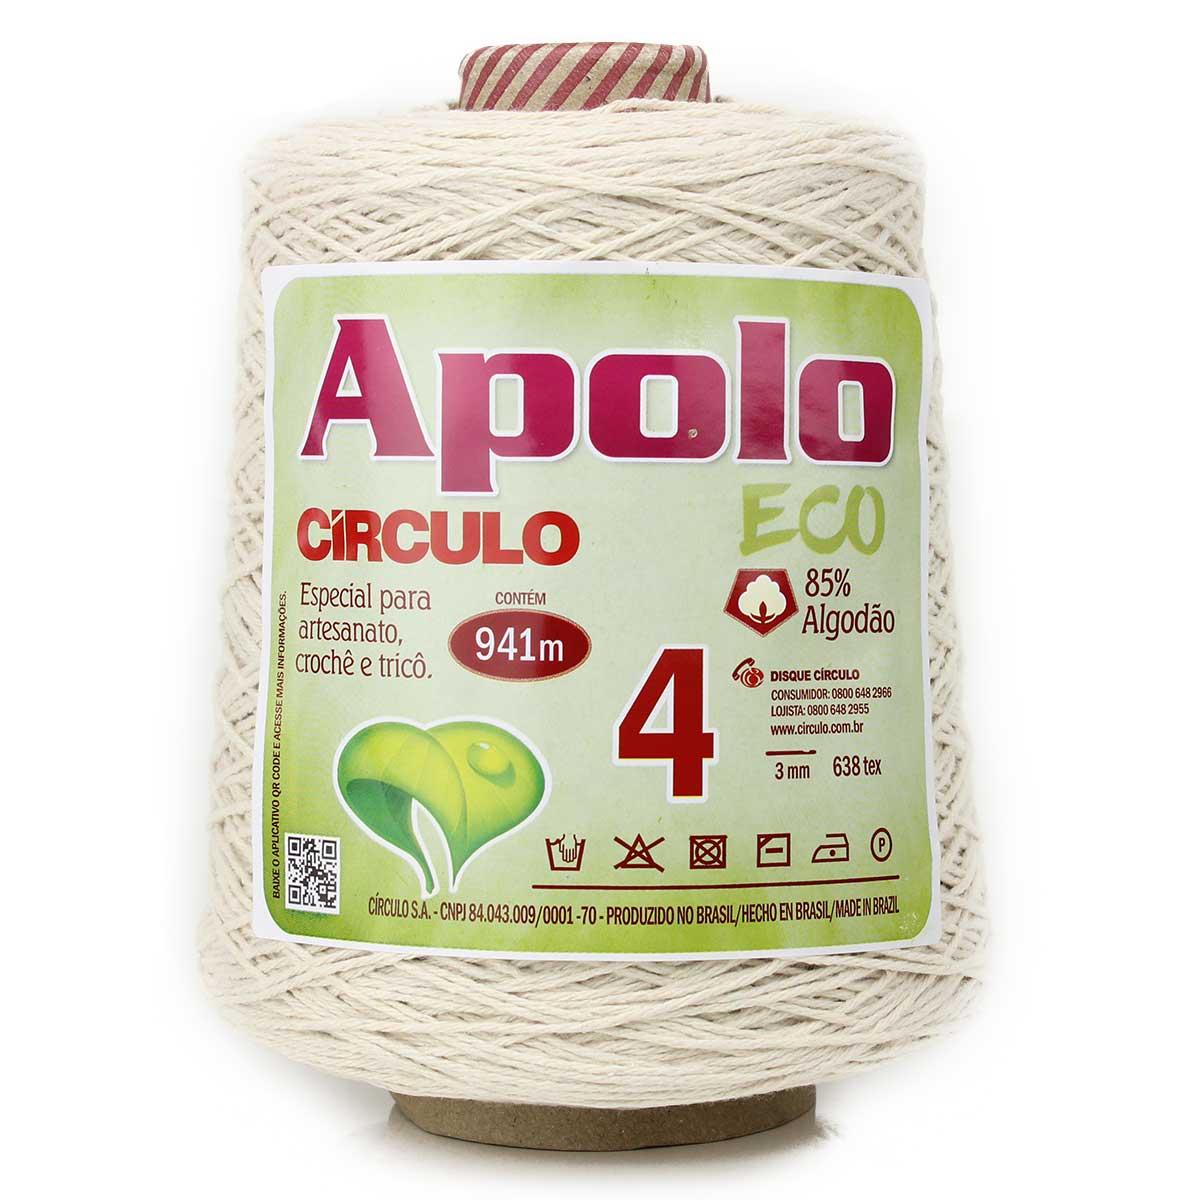 Barbante Apolo Eco Crú N04 600g - Círculo